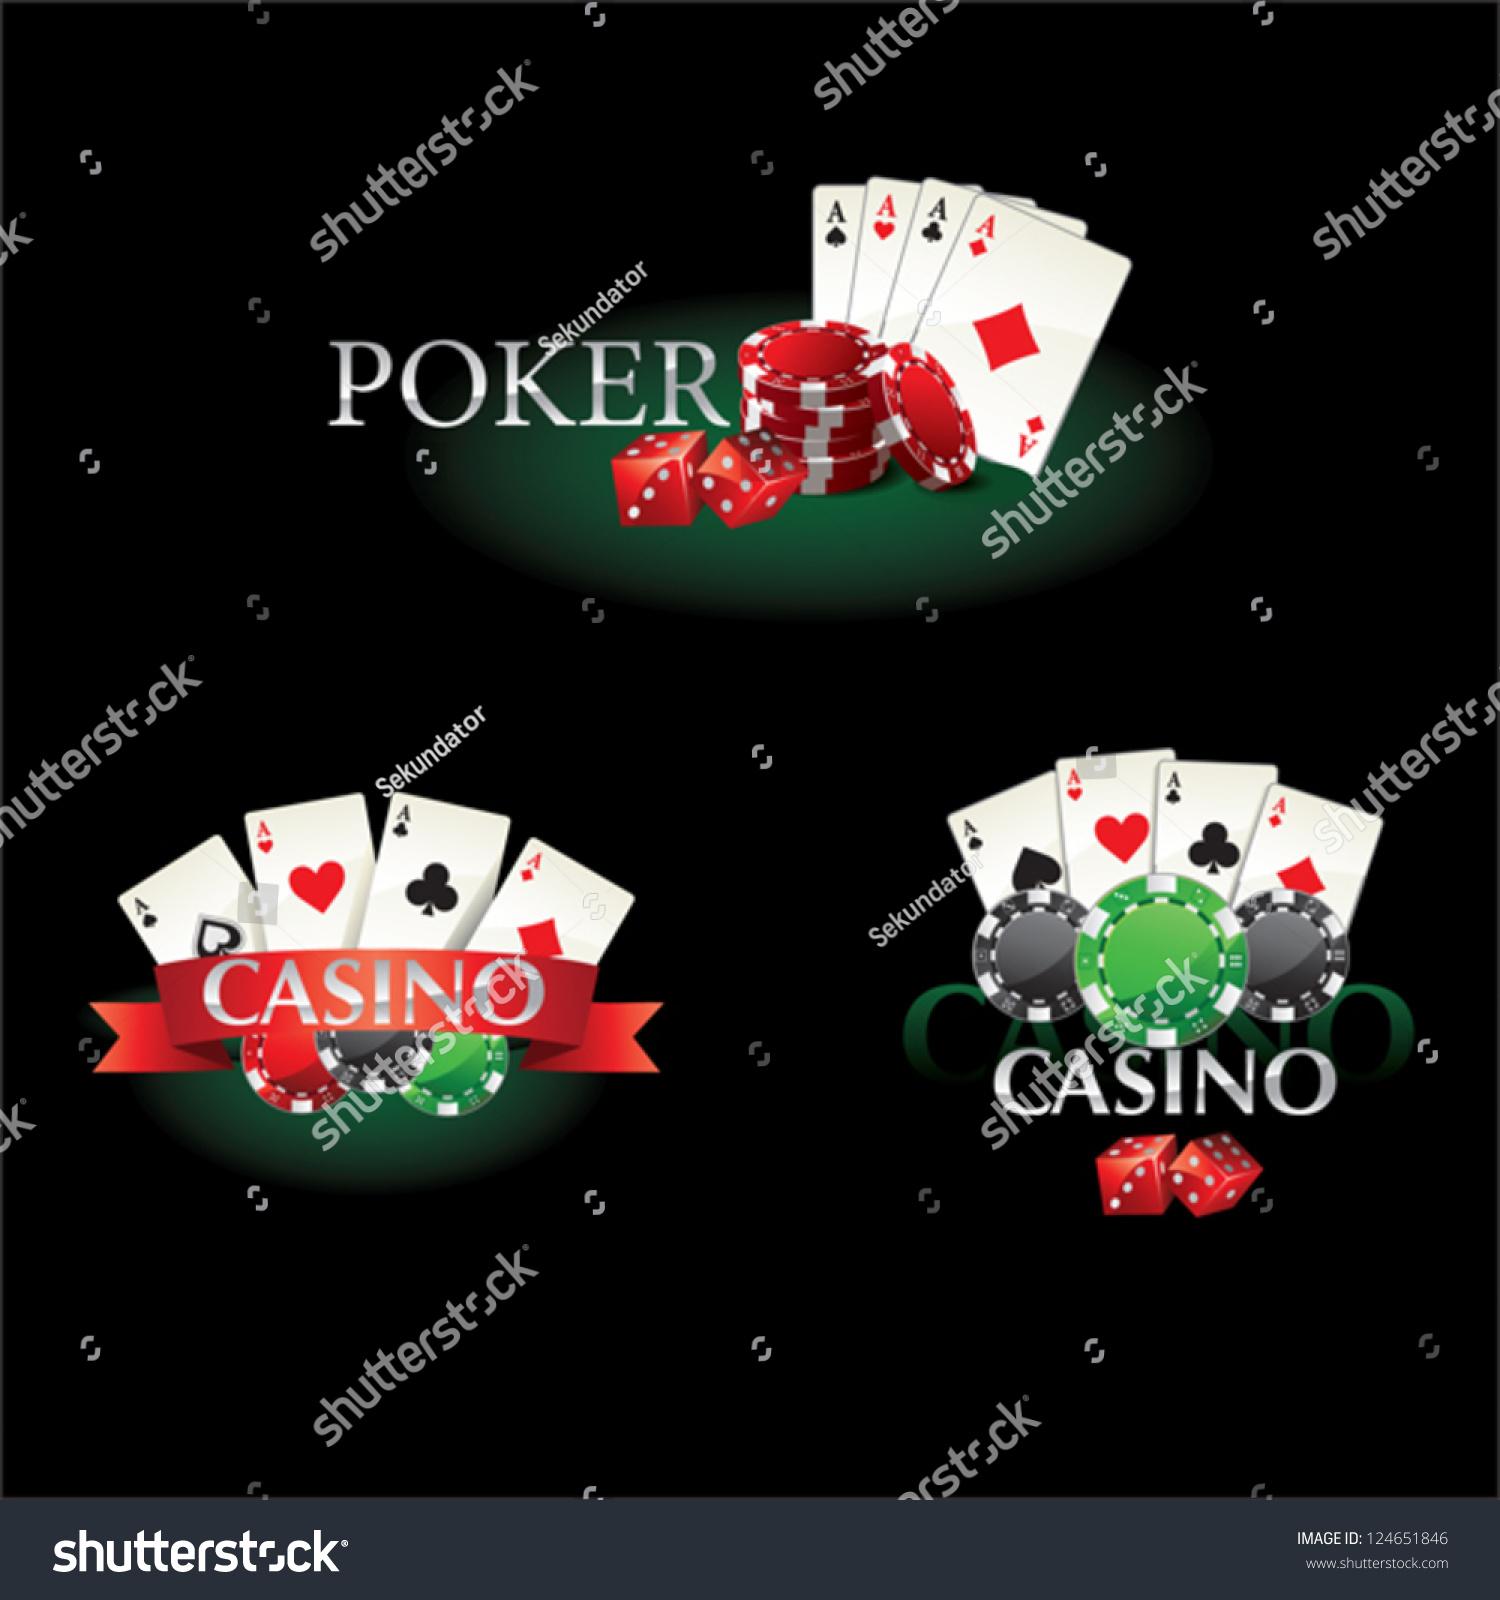 poker casino nrw